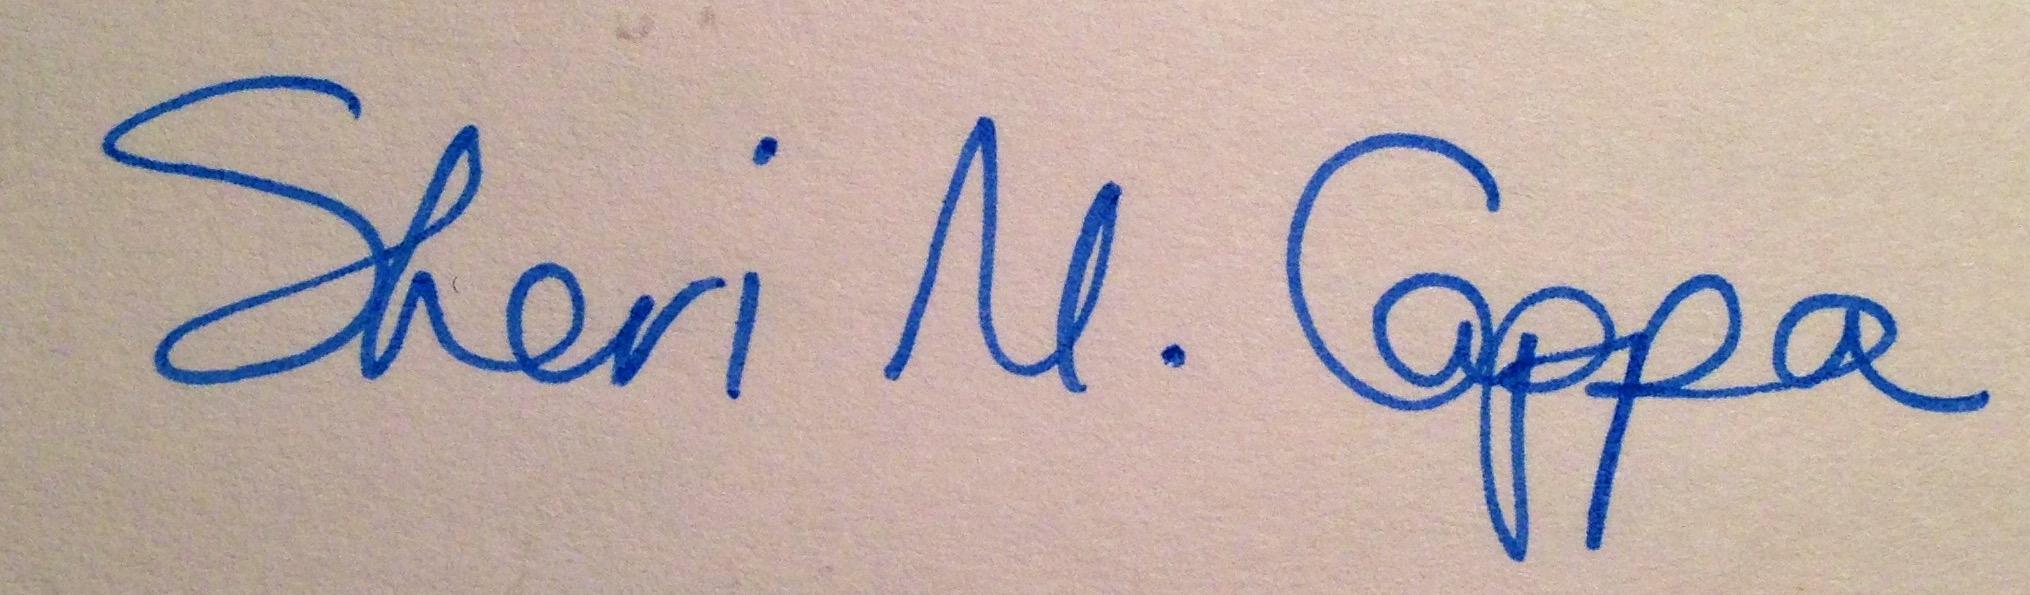 Sheri Cappa's Signature